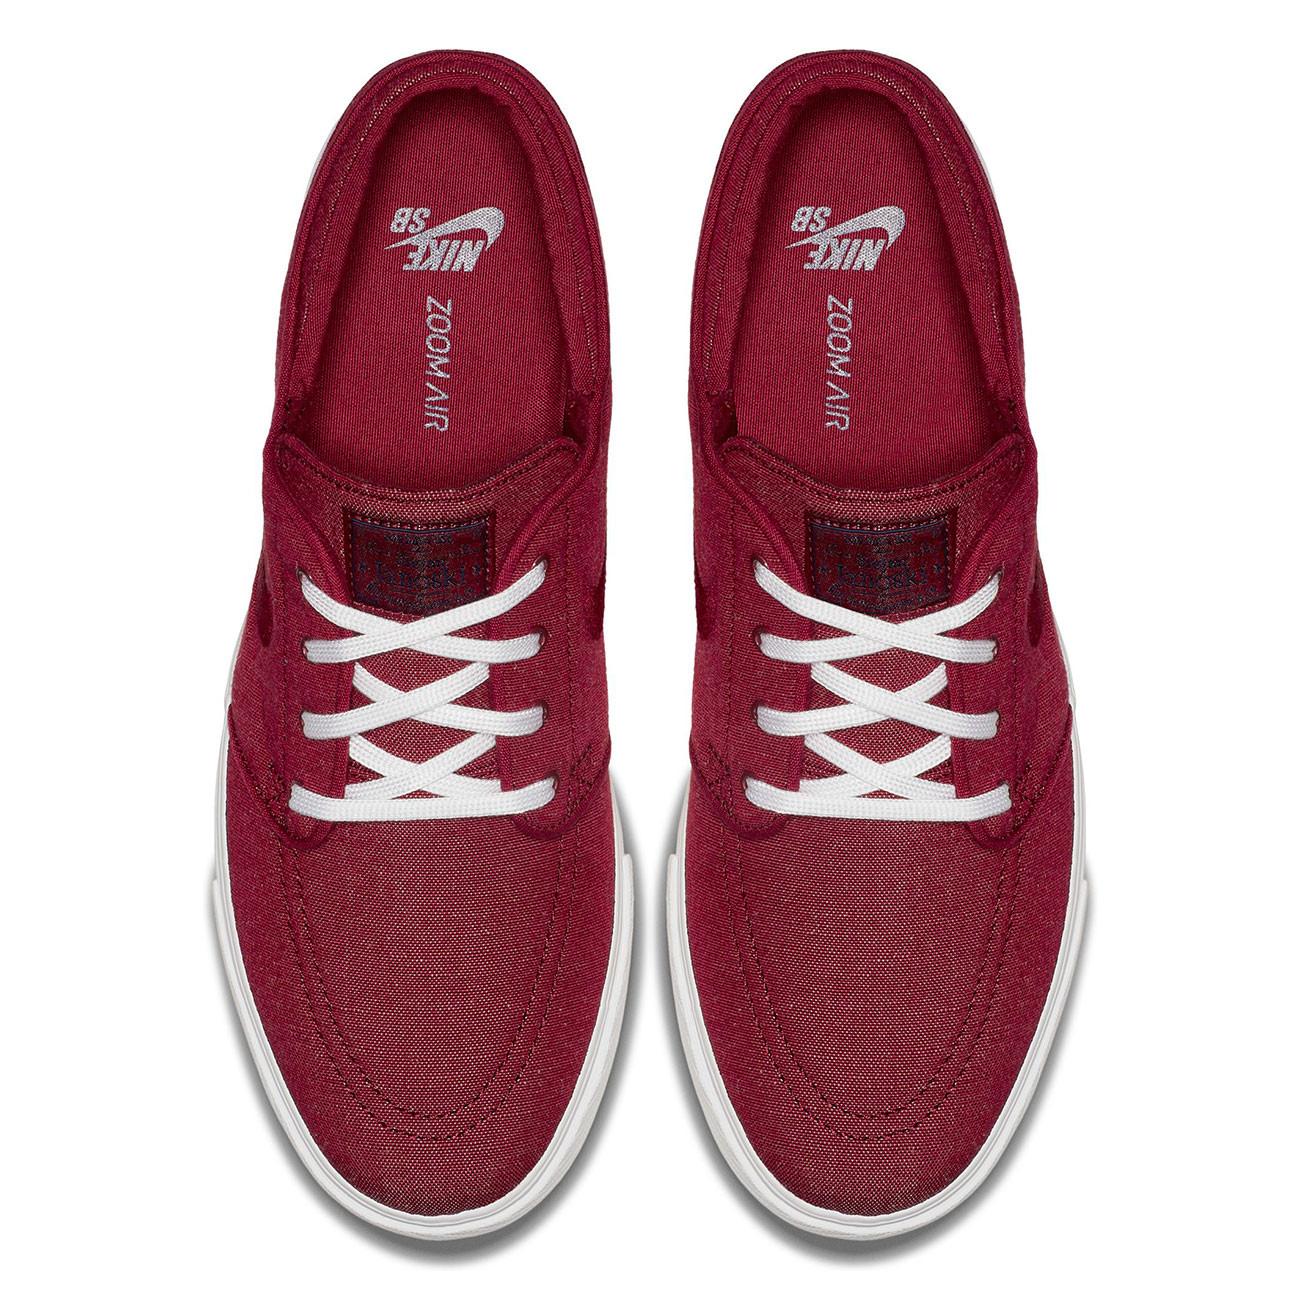 Tenisky Nike SB Zoom Stefan Janoski Canvas red crush red crush-white 97bf340516